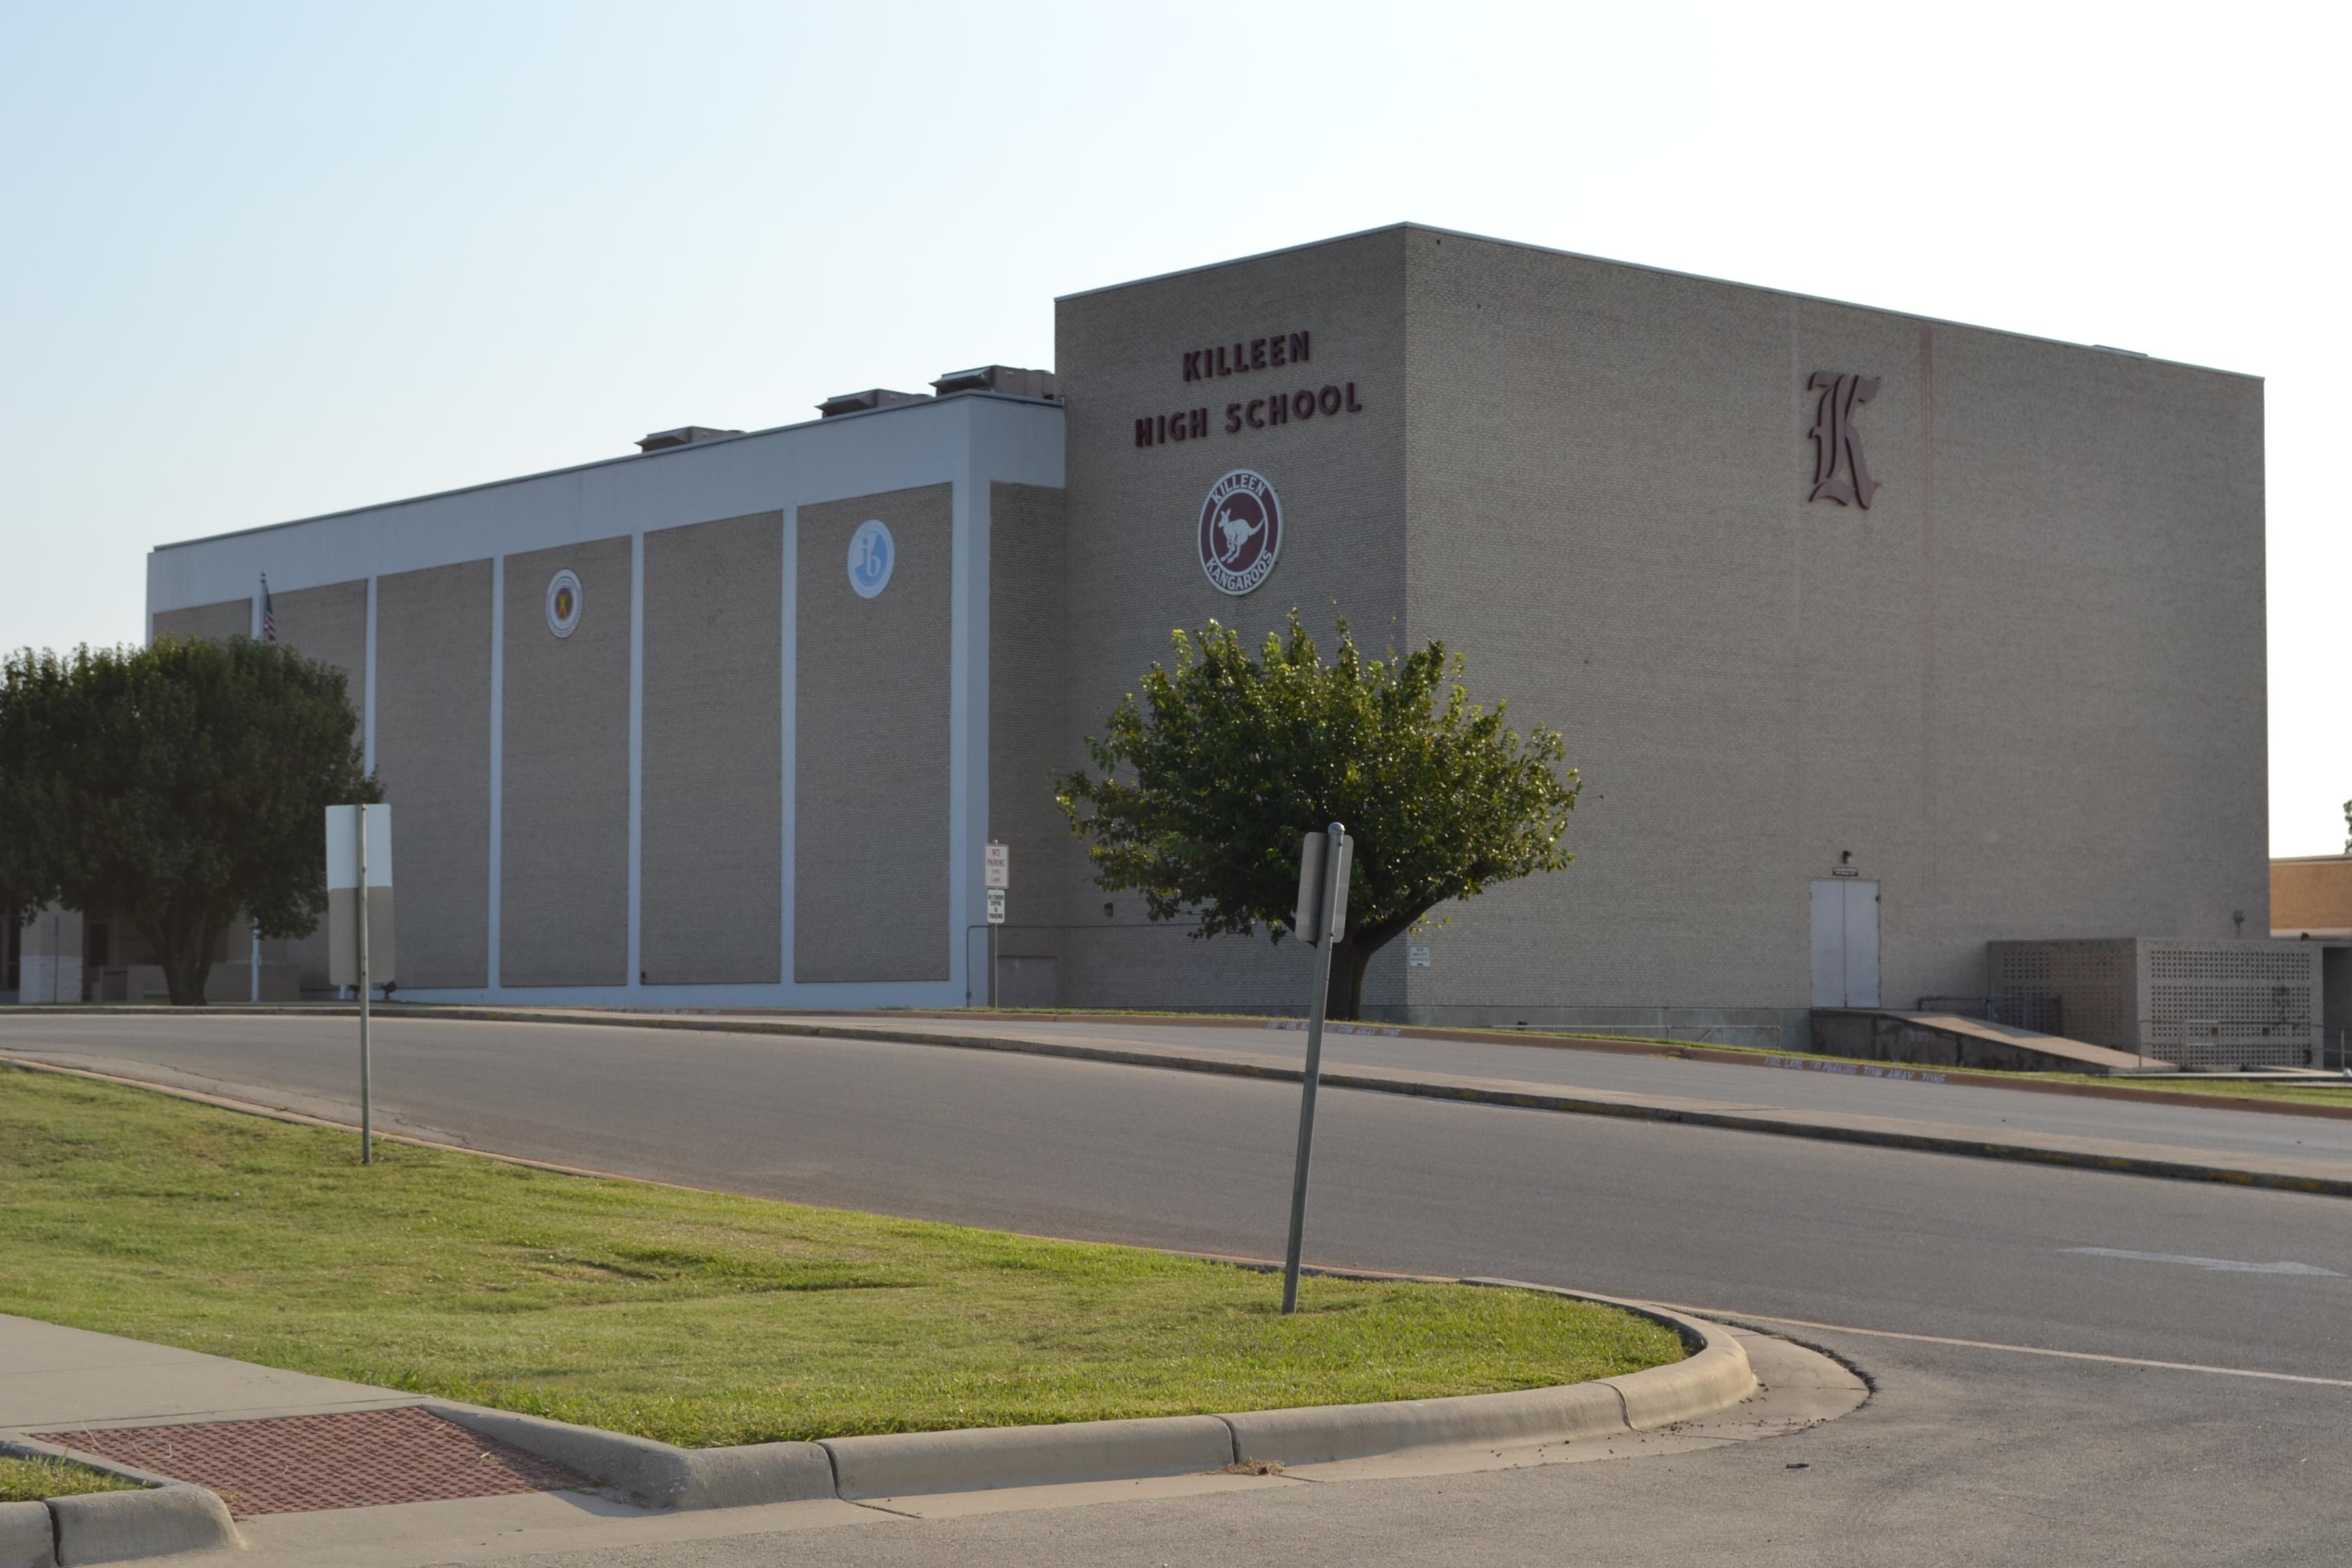 File:Killeen High School 01 jpg - Wikimedia Commons